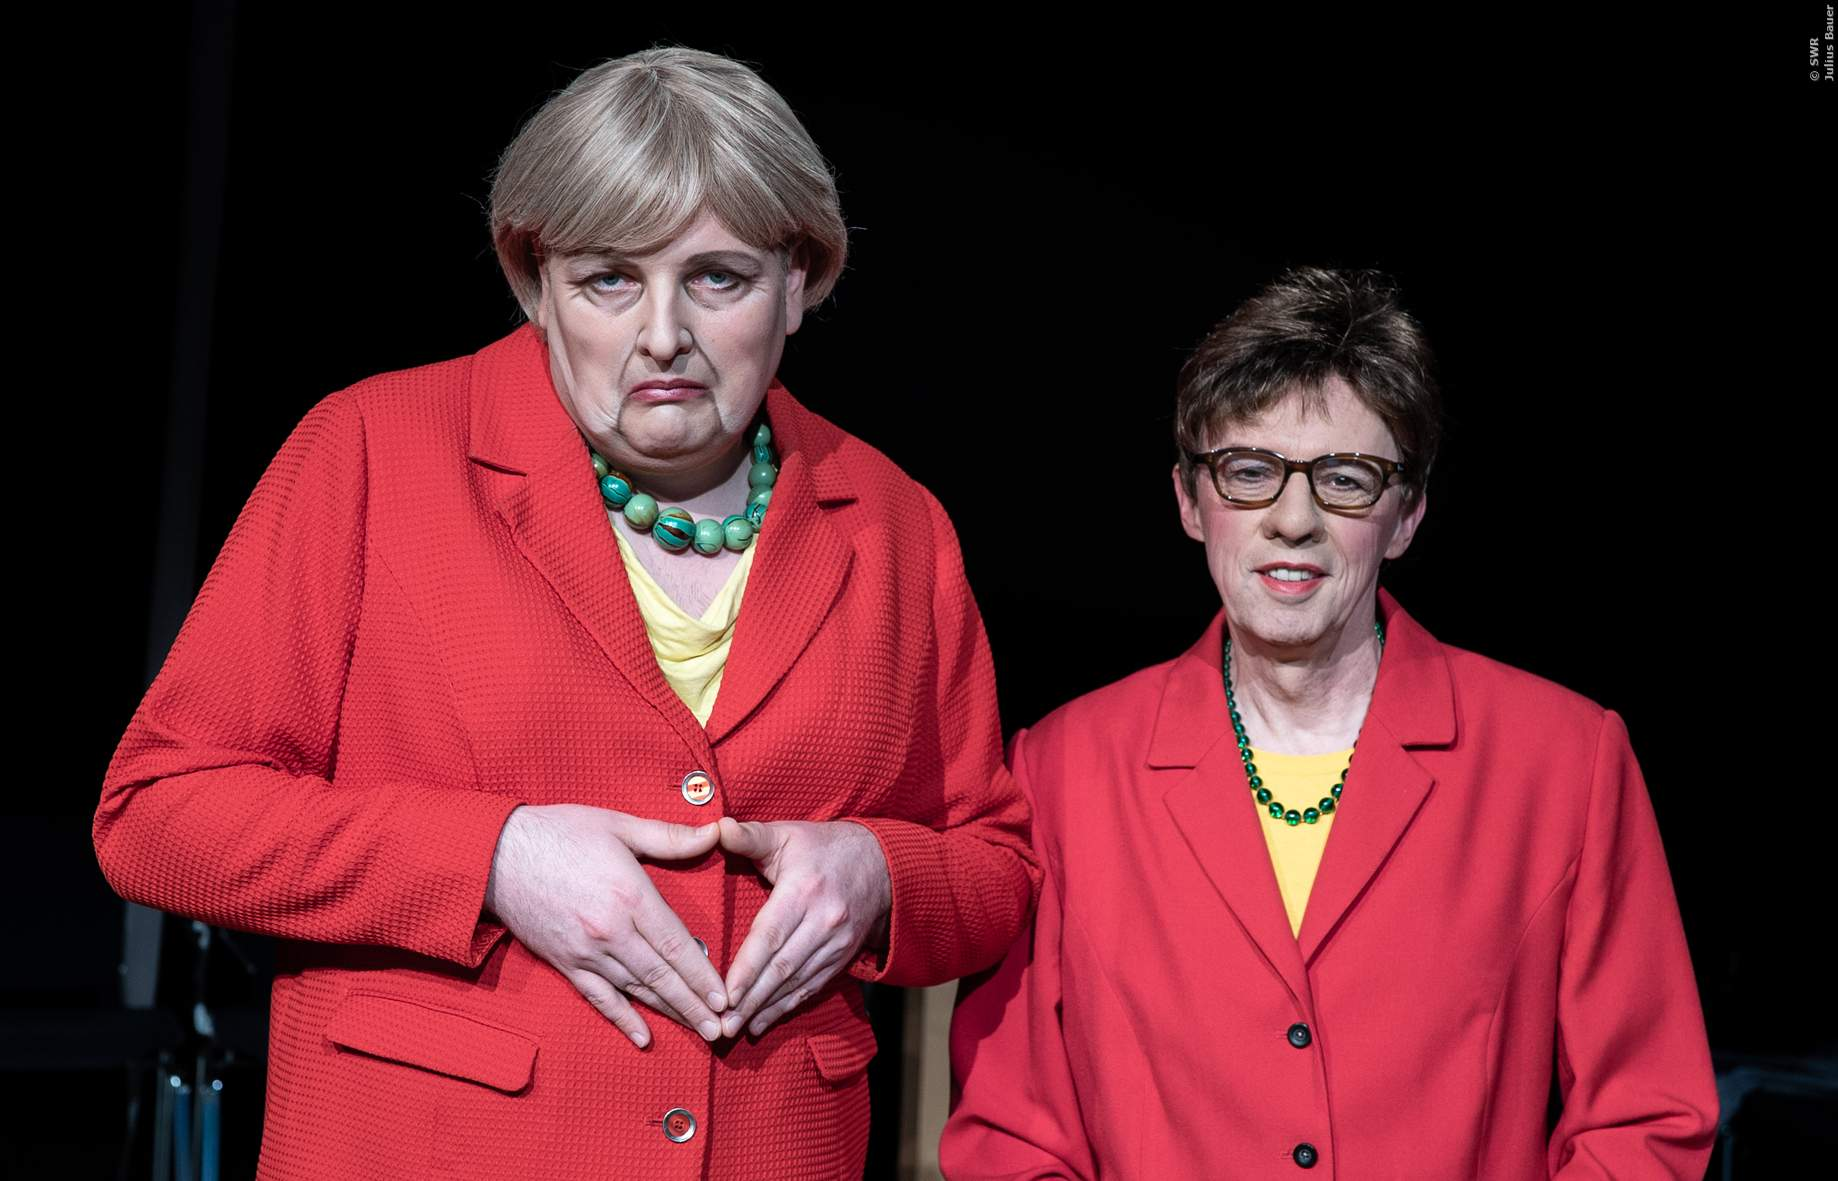 AKK und Angela Merkel